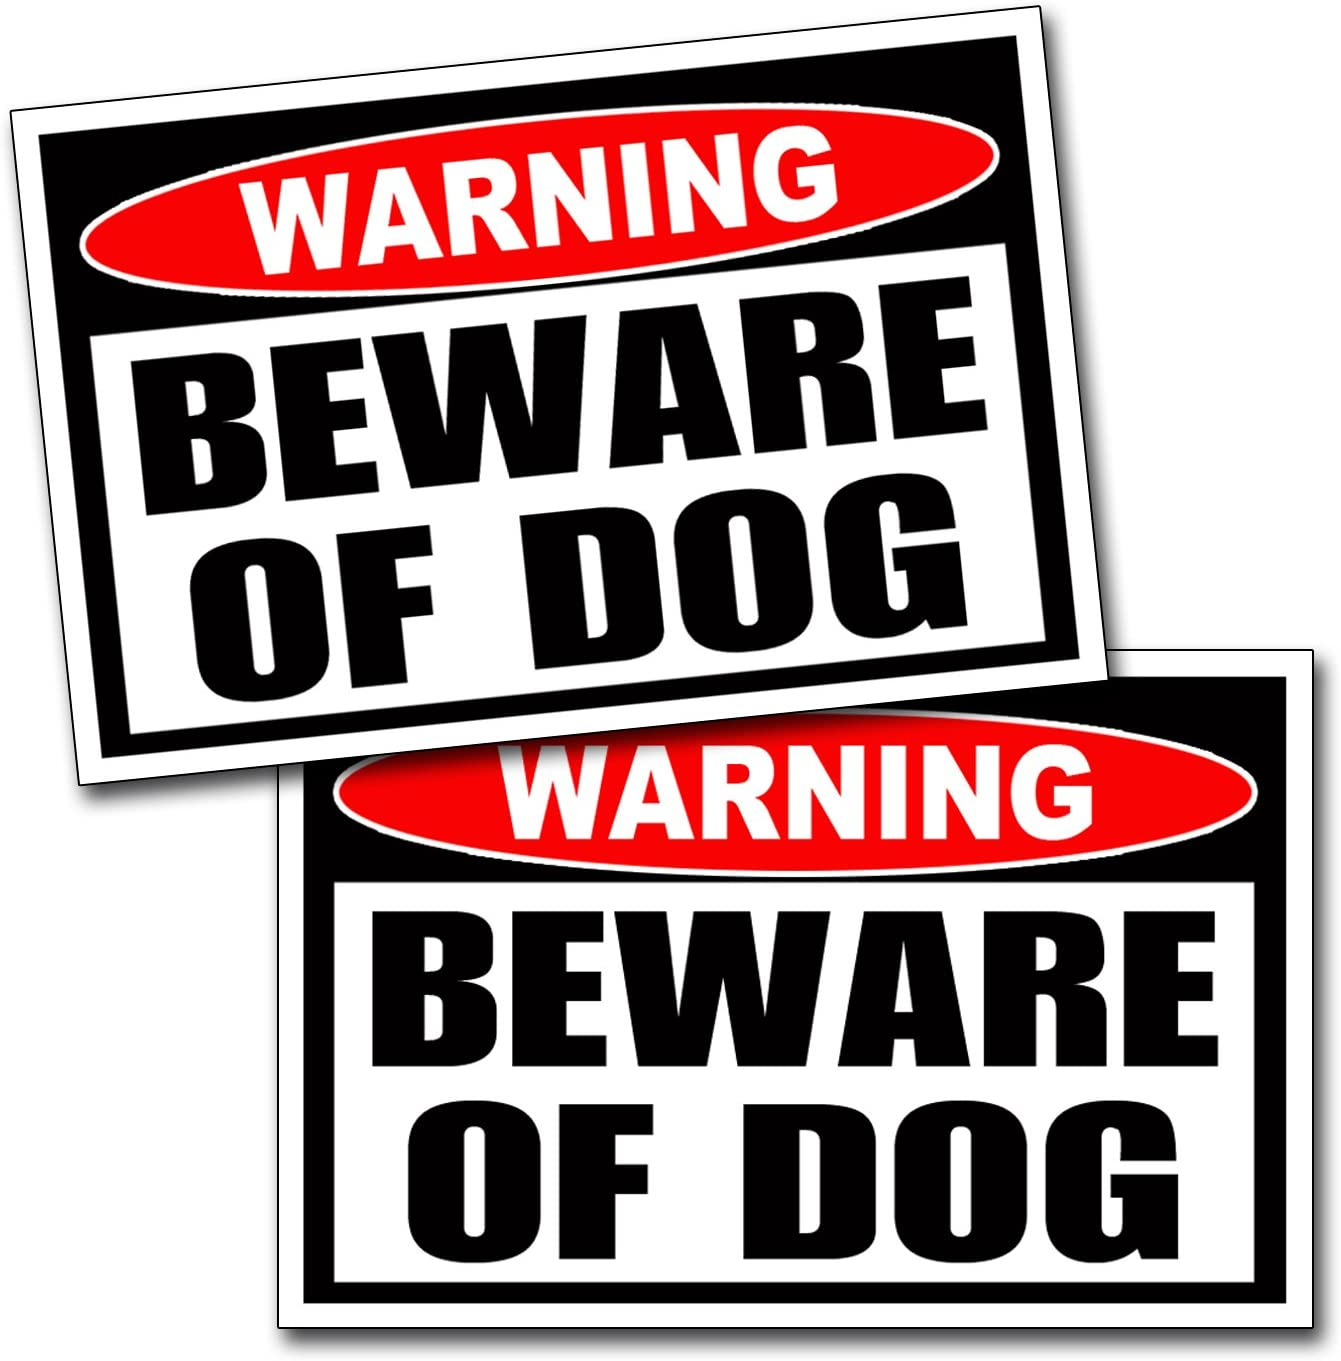 Danger Beware Of Dog Sticker Decal Safety Sign Car Vinyl